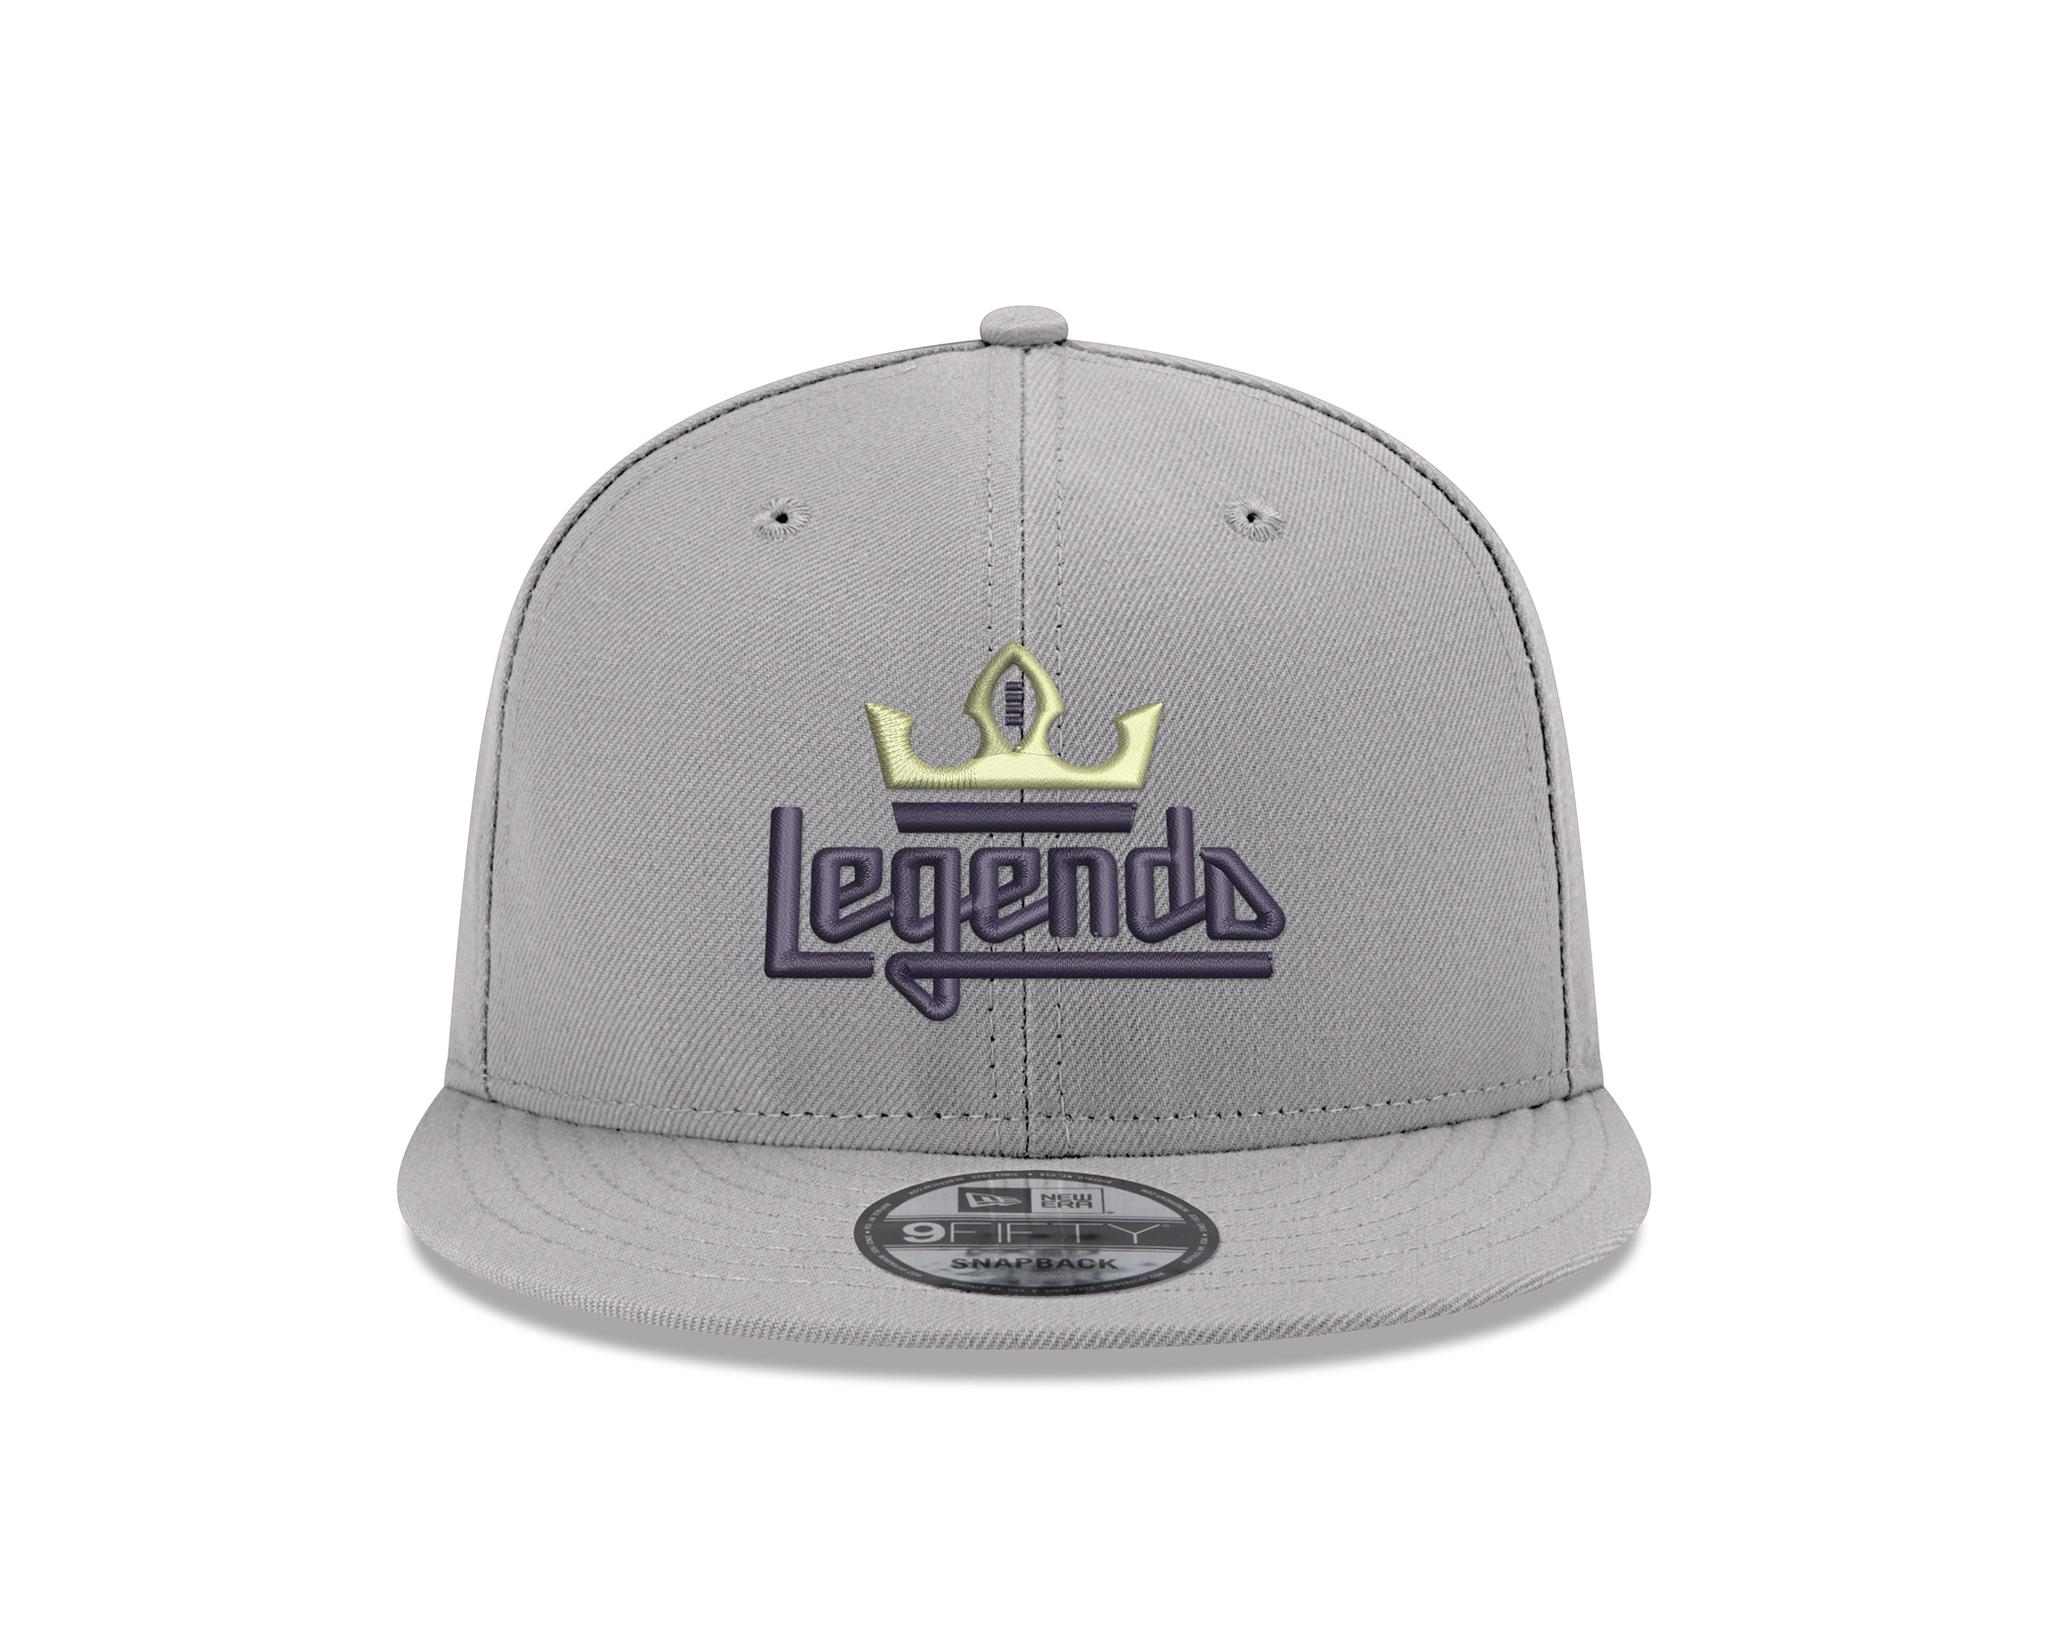 Alliance Of American Football Names New Era Cap The Official Sideline  Headwear Partner 379a04da1135